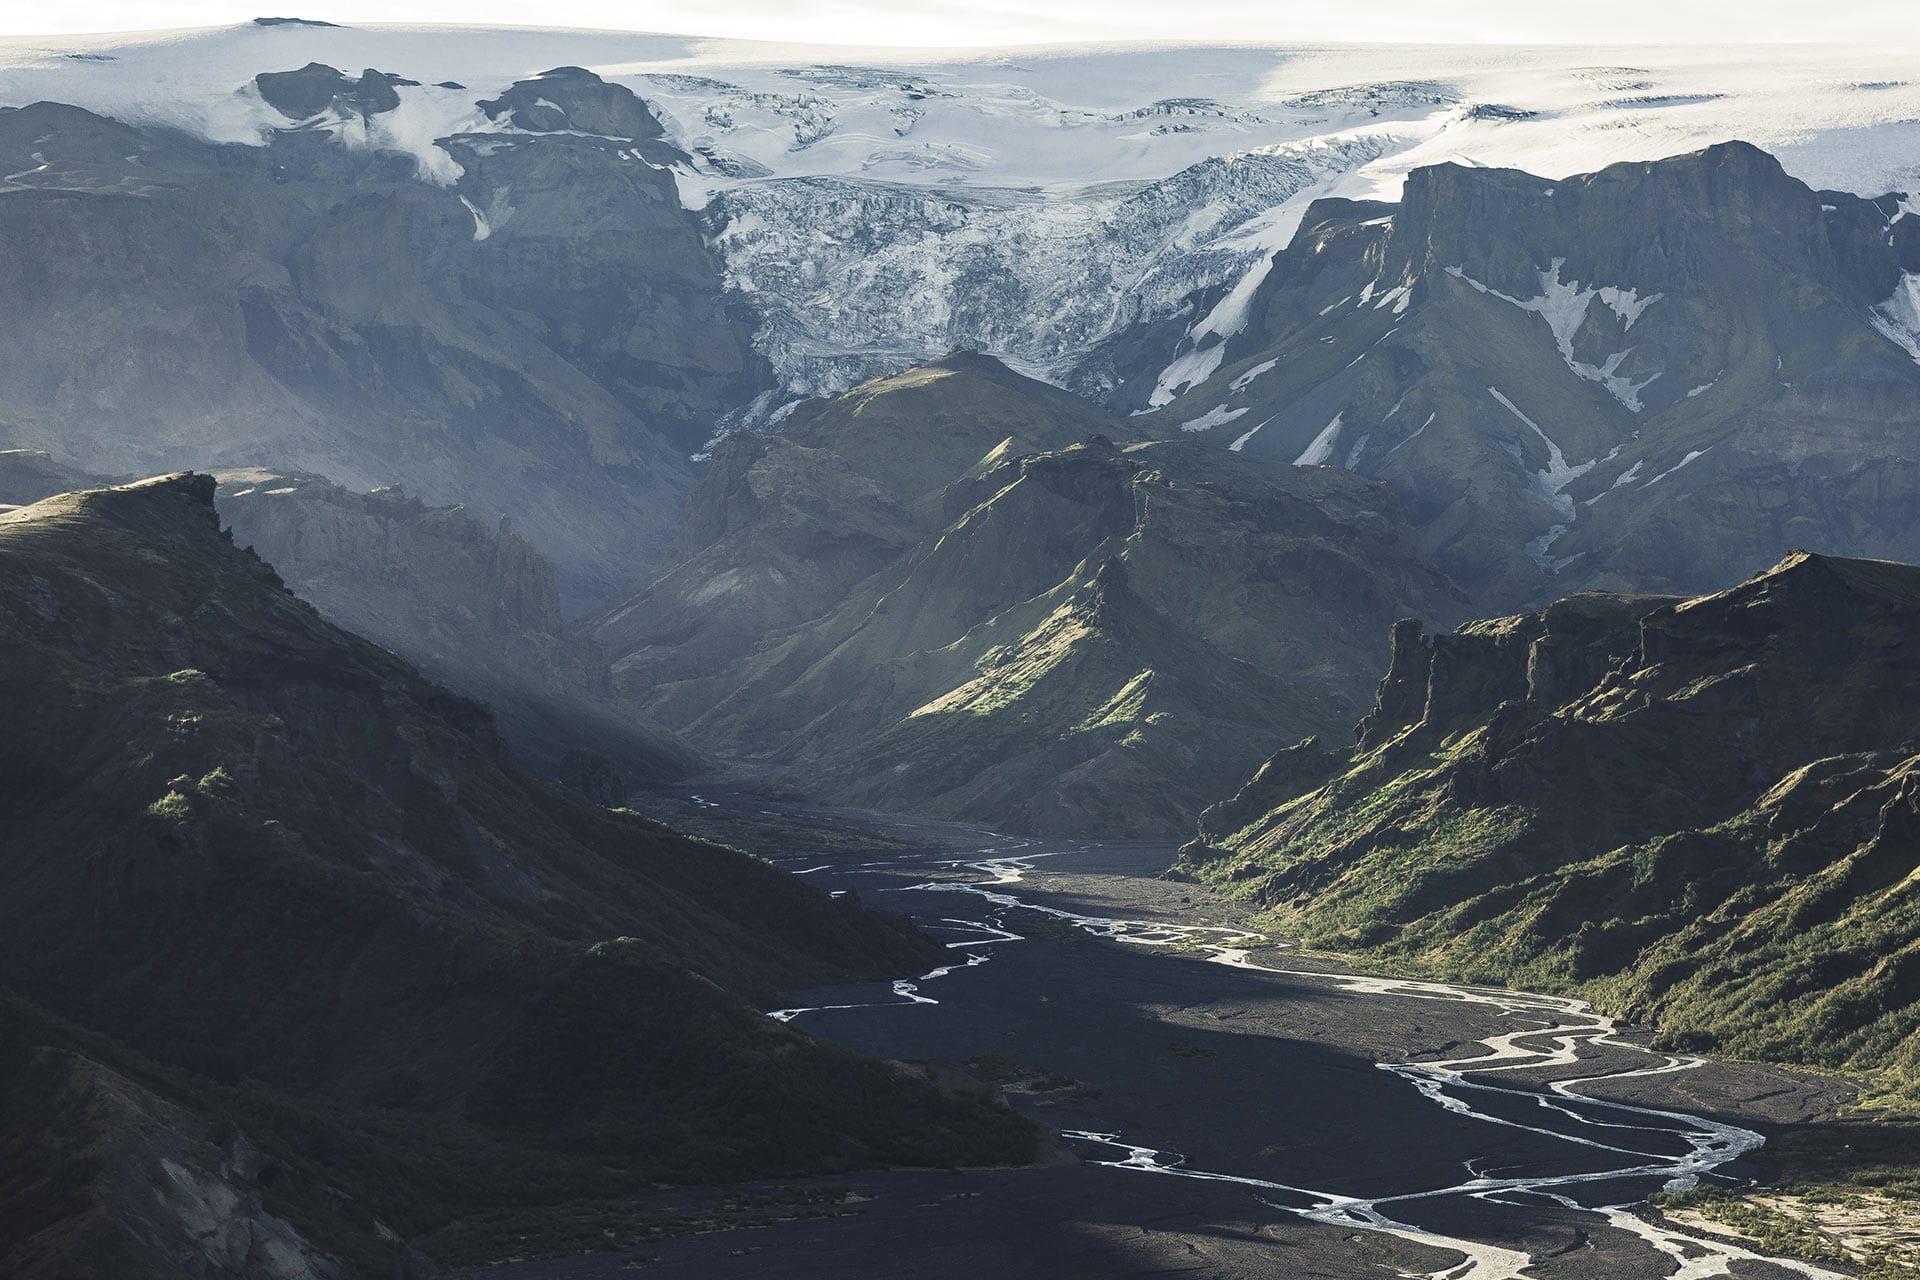 Þórsmörk in the highlands of Iceland